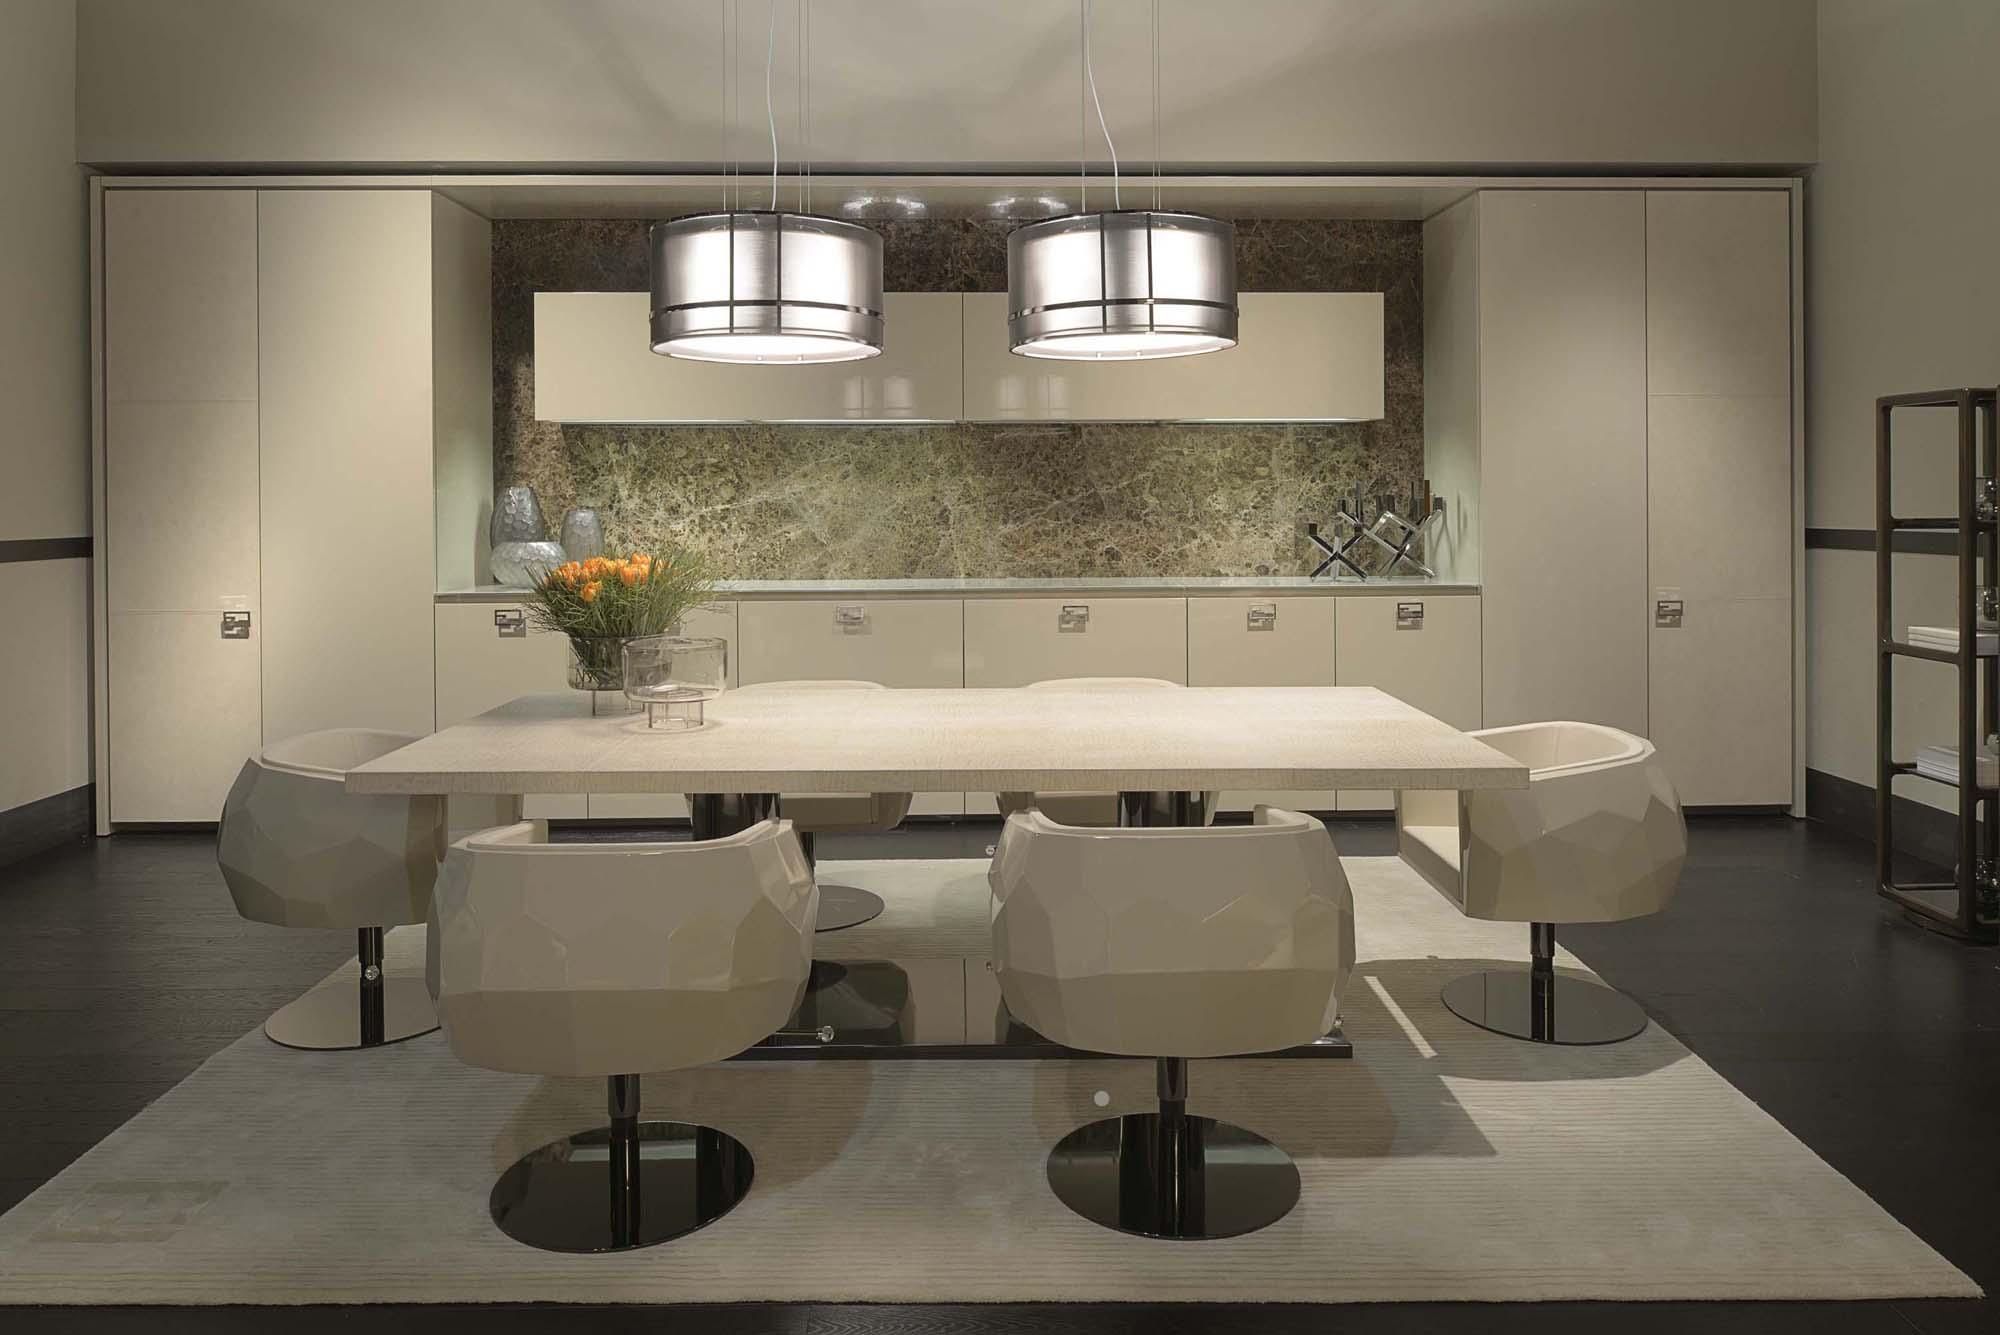 Muebles de cocina fendi gunni trentino Diseno de cocinas 2016